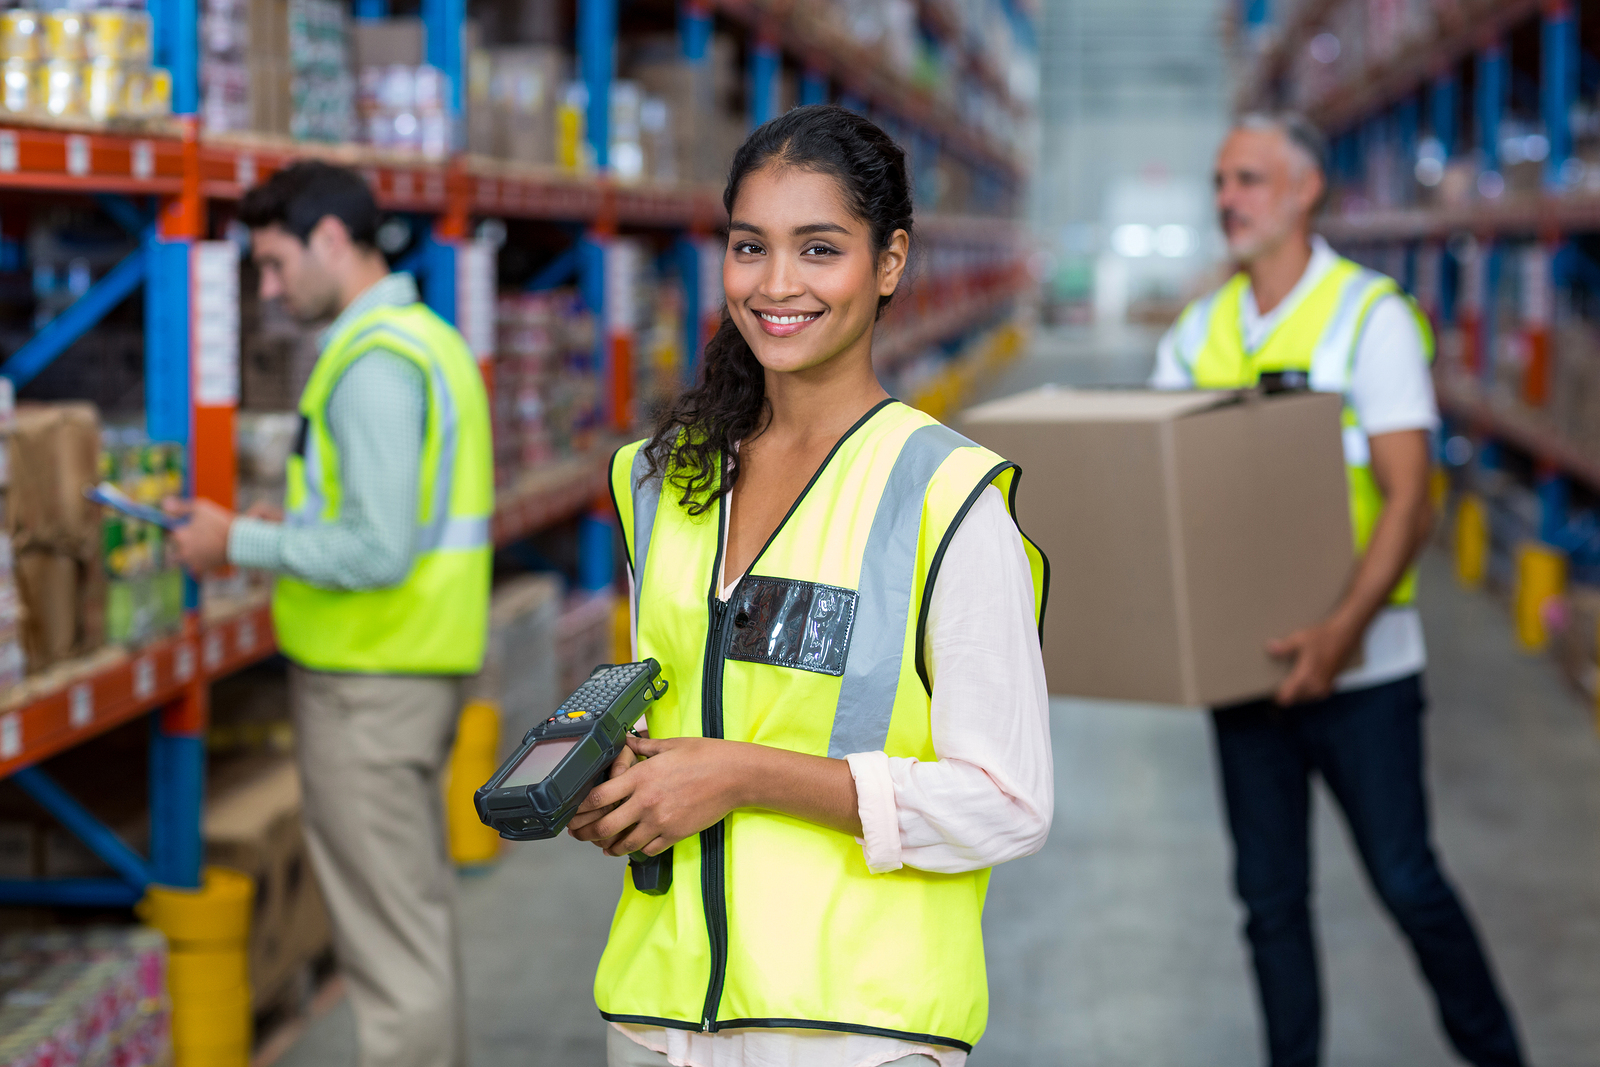 bigstock-Portrait-of-female-warehouse-w-154609223.jpg